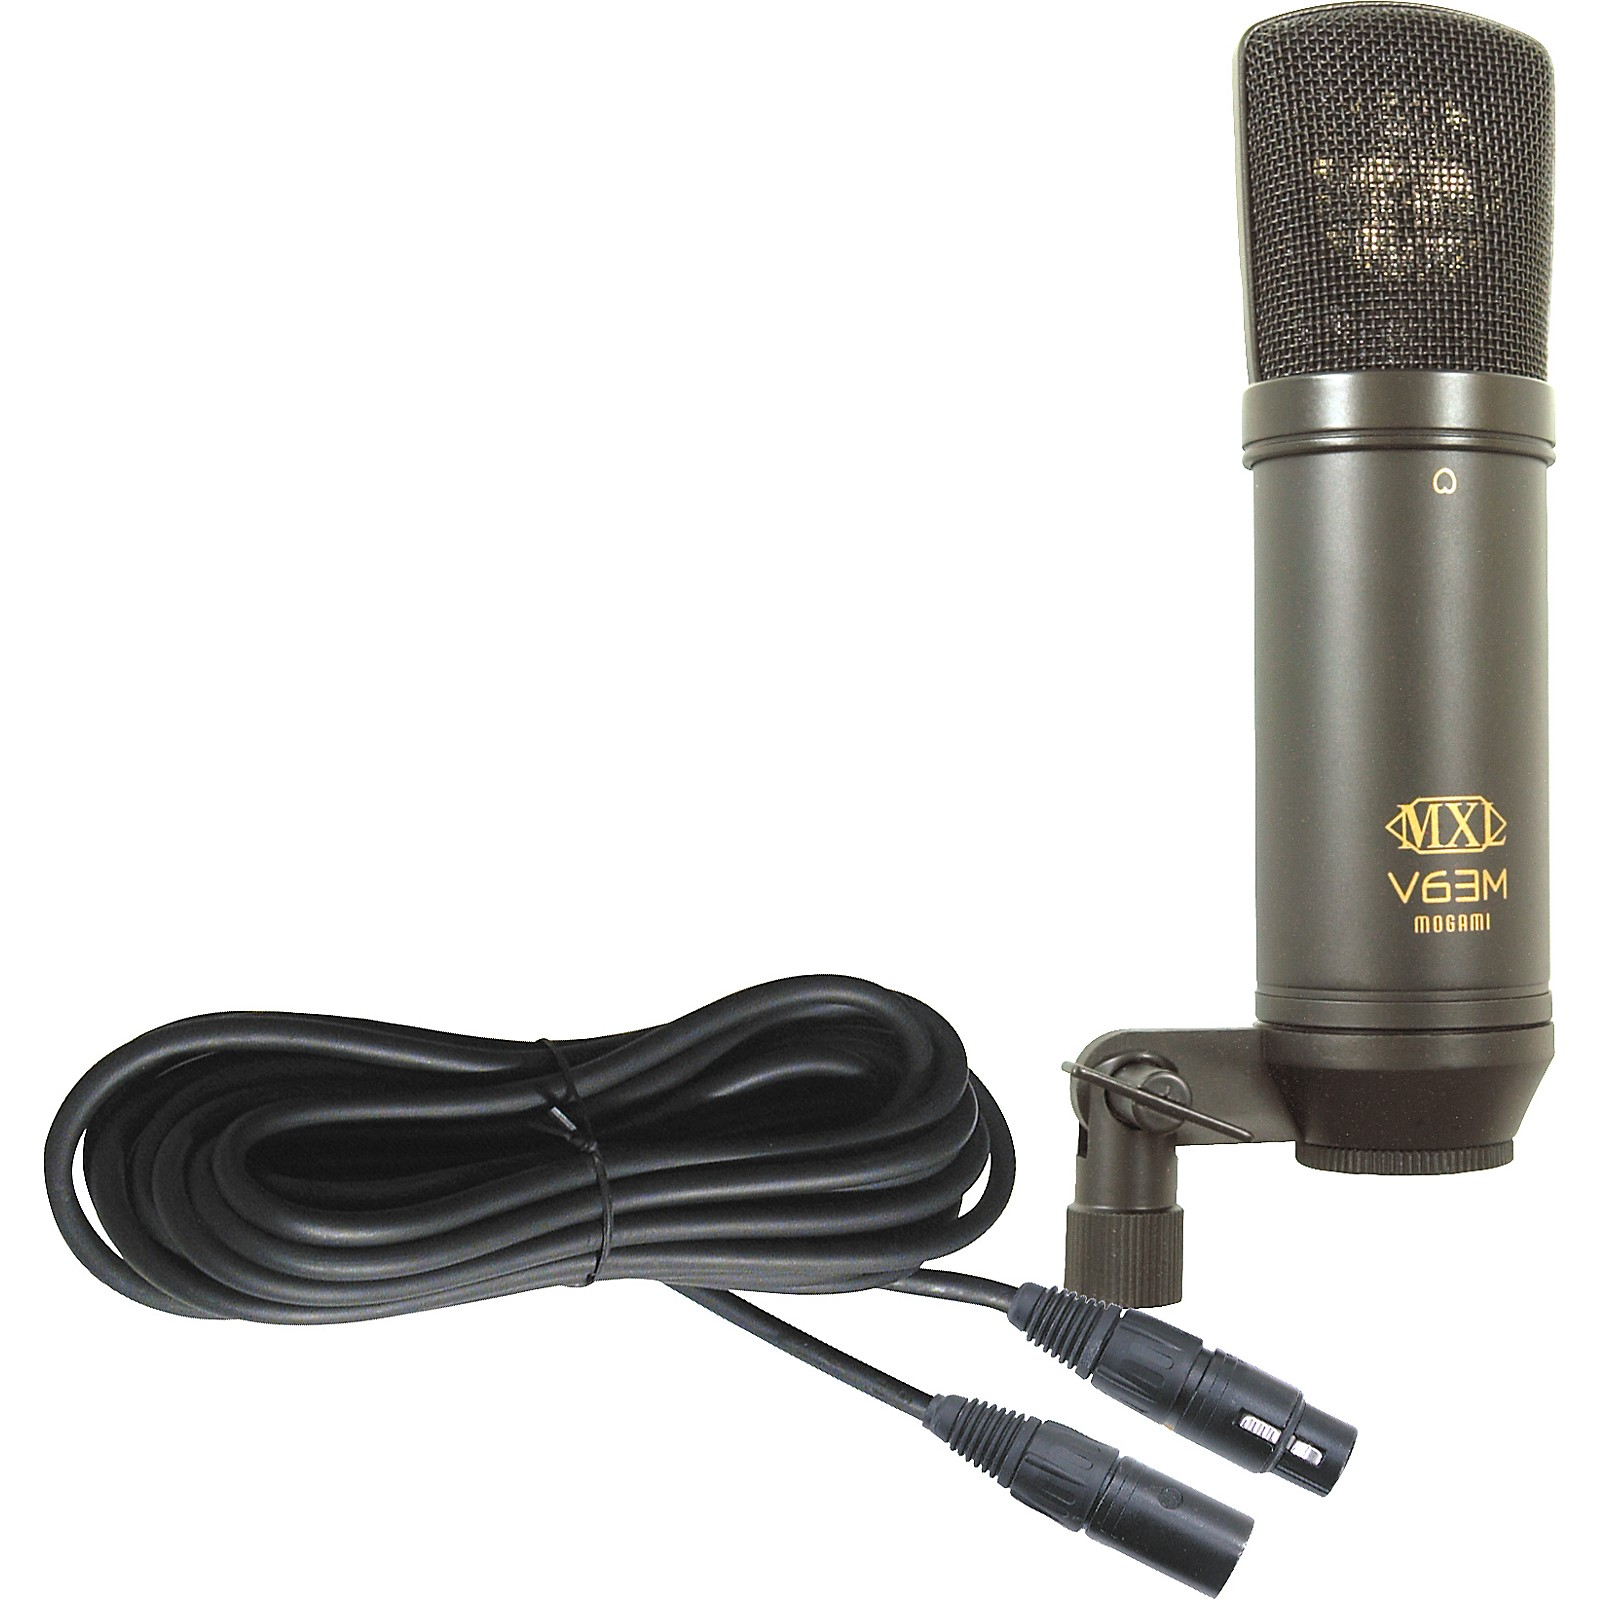 MXL V63M Condender Studio Mic with Mogami Mic Cable